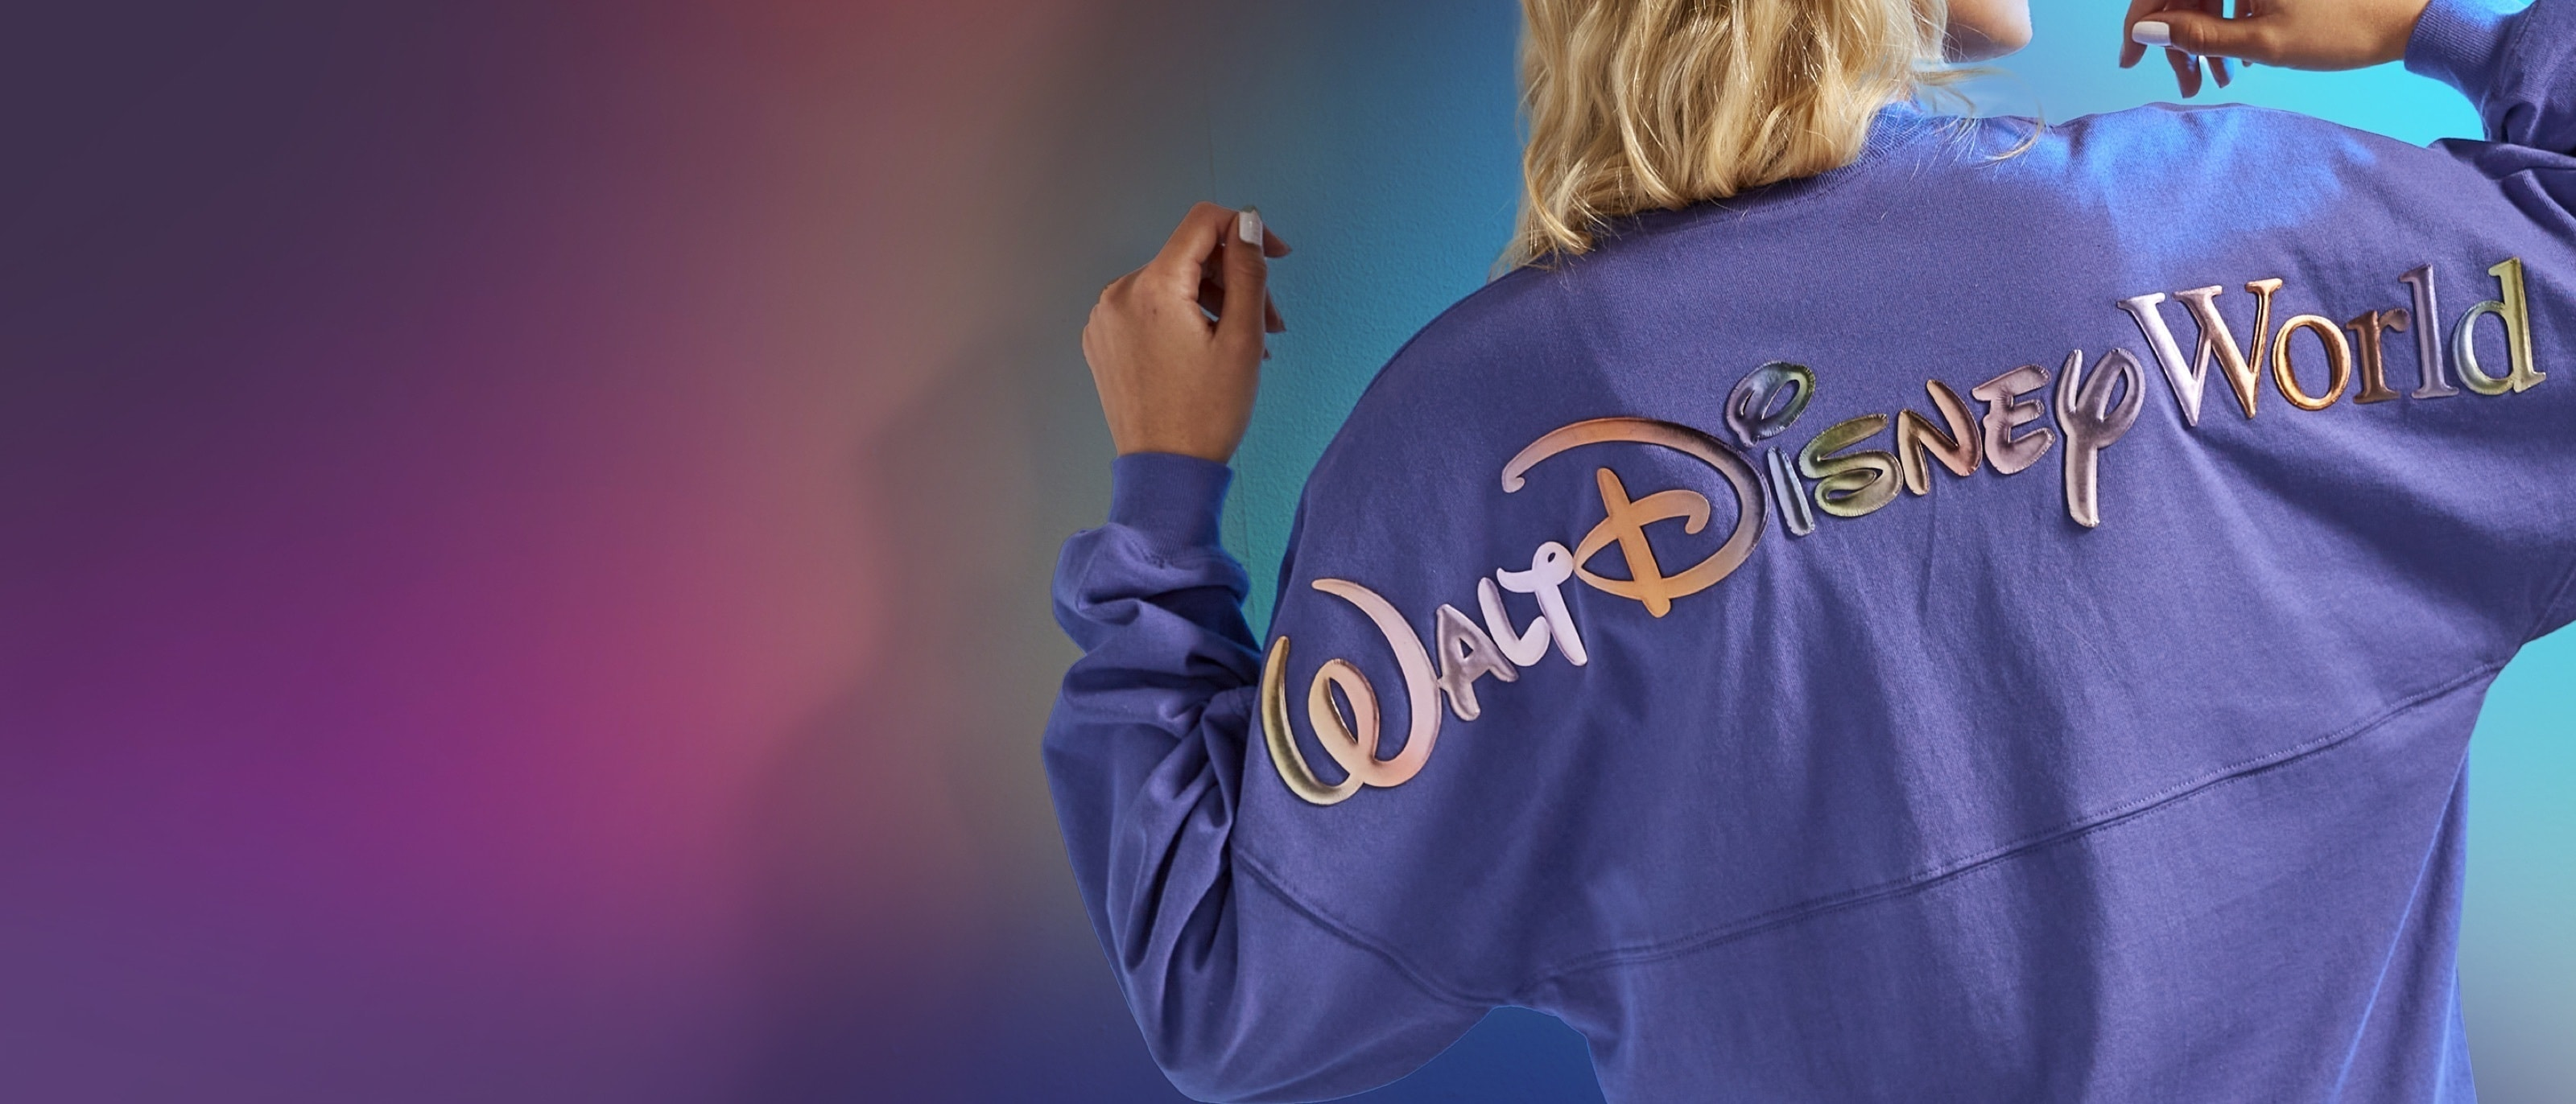 Buy Walt Disney World 50 collection at shopDisney